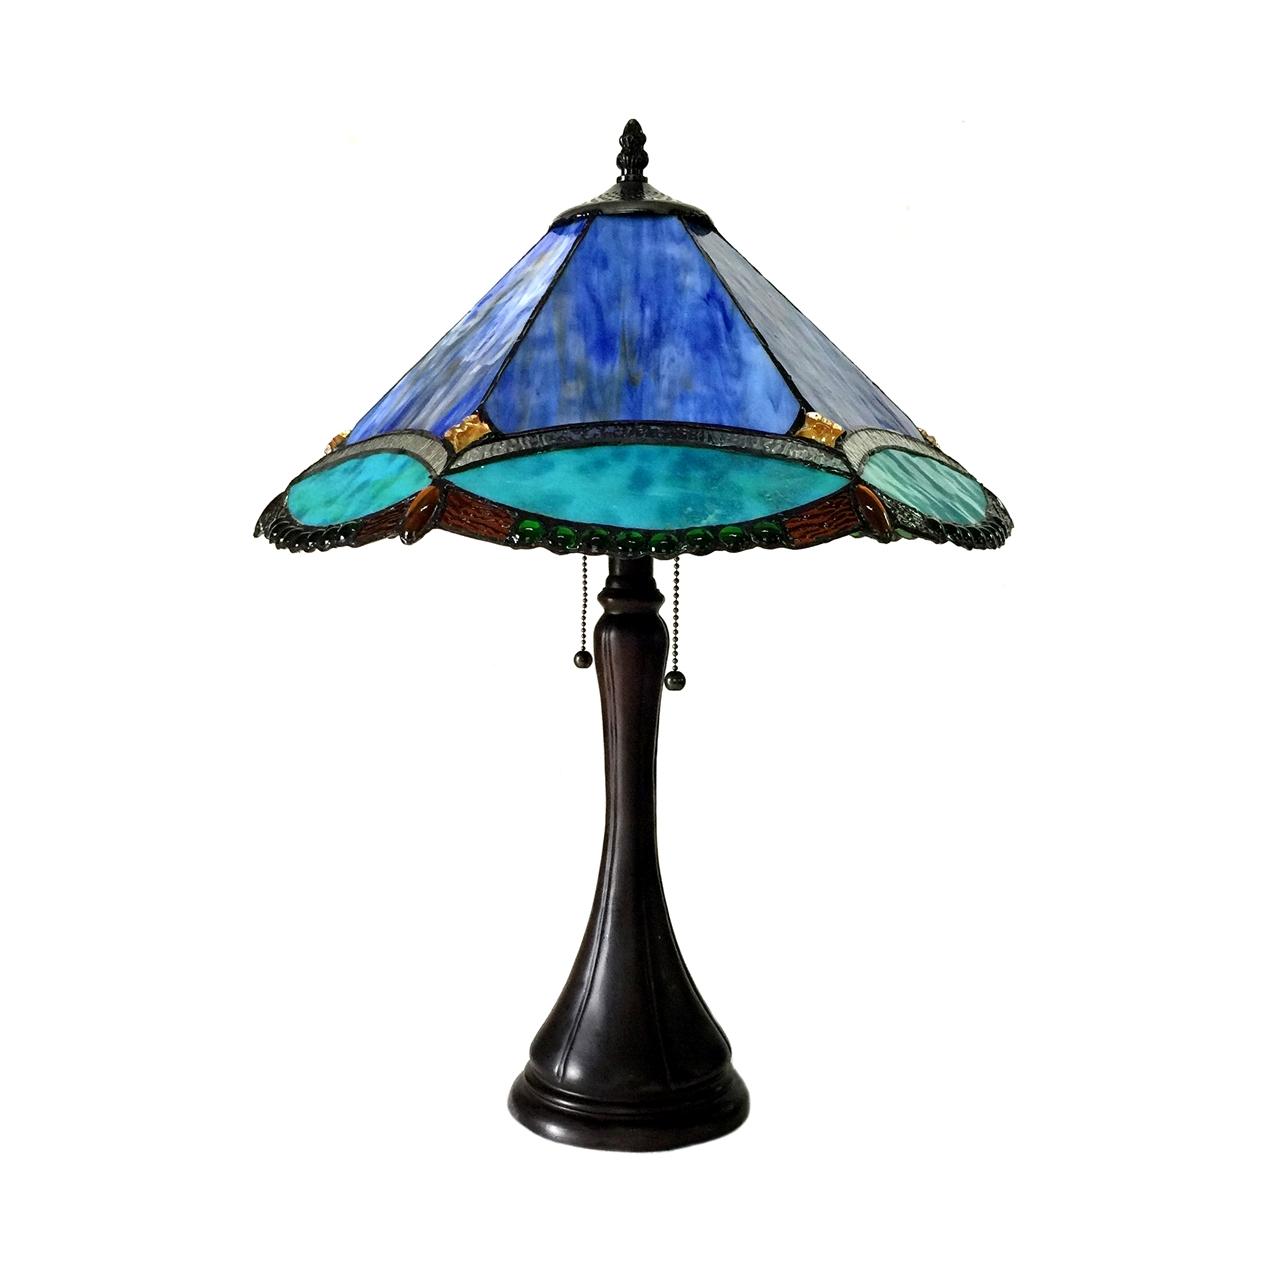 Chloe Lighting Inc Chloe Lighting Amphitrite Tiffany Style 2 Light Victorian Table Lamp 17 Quot Shade